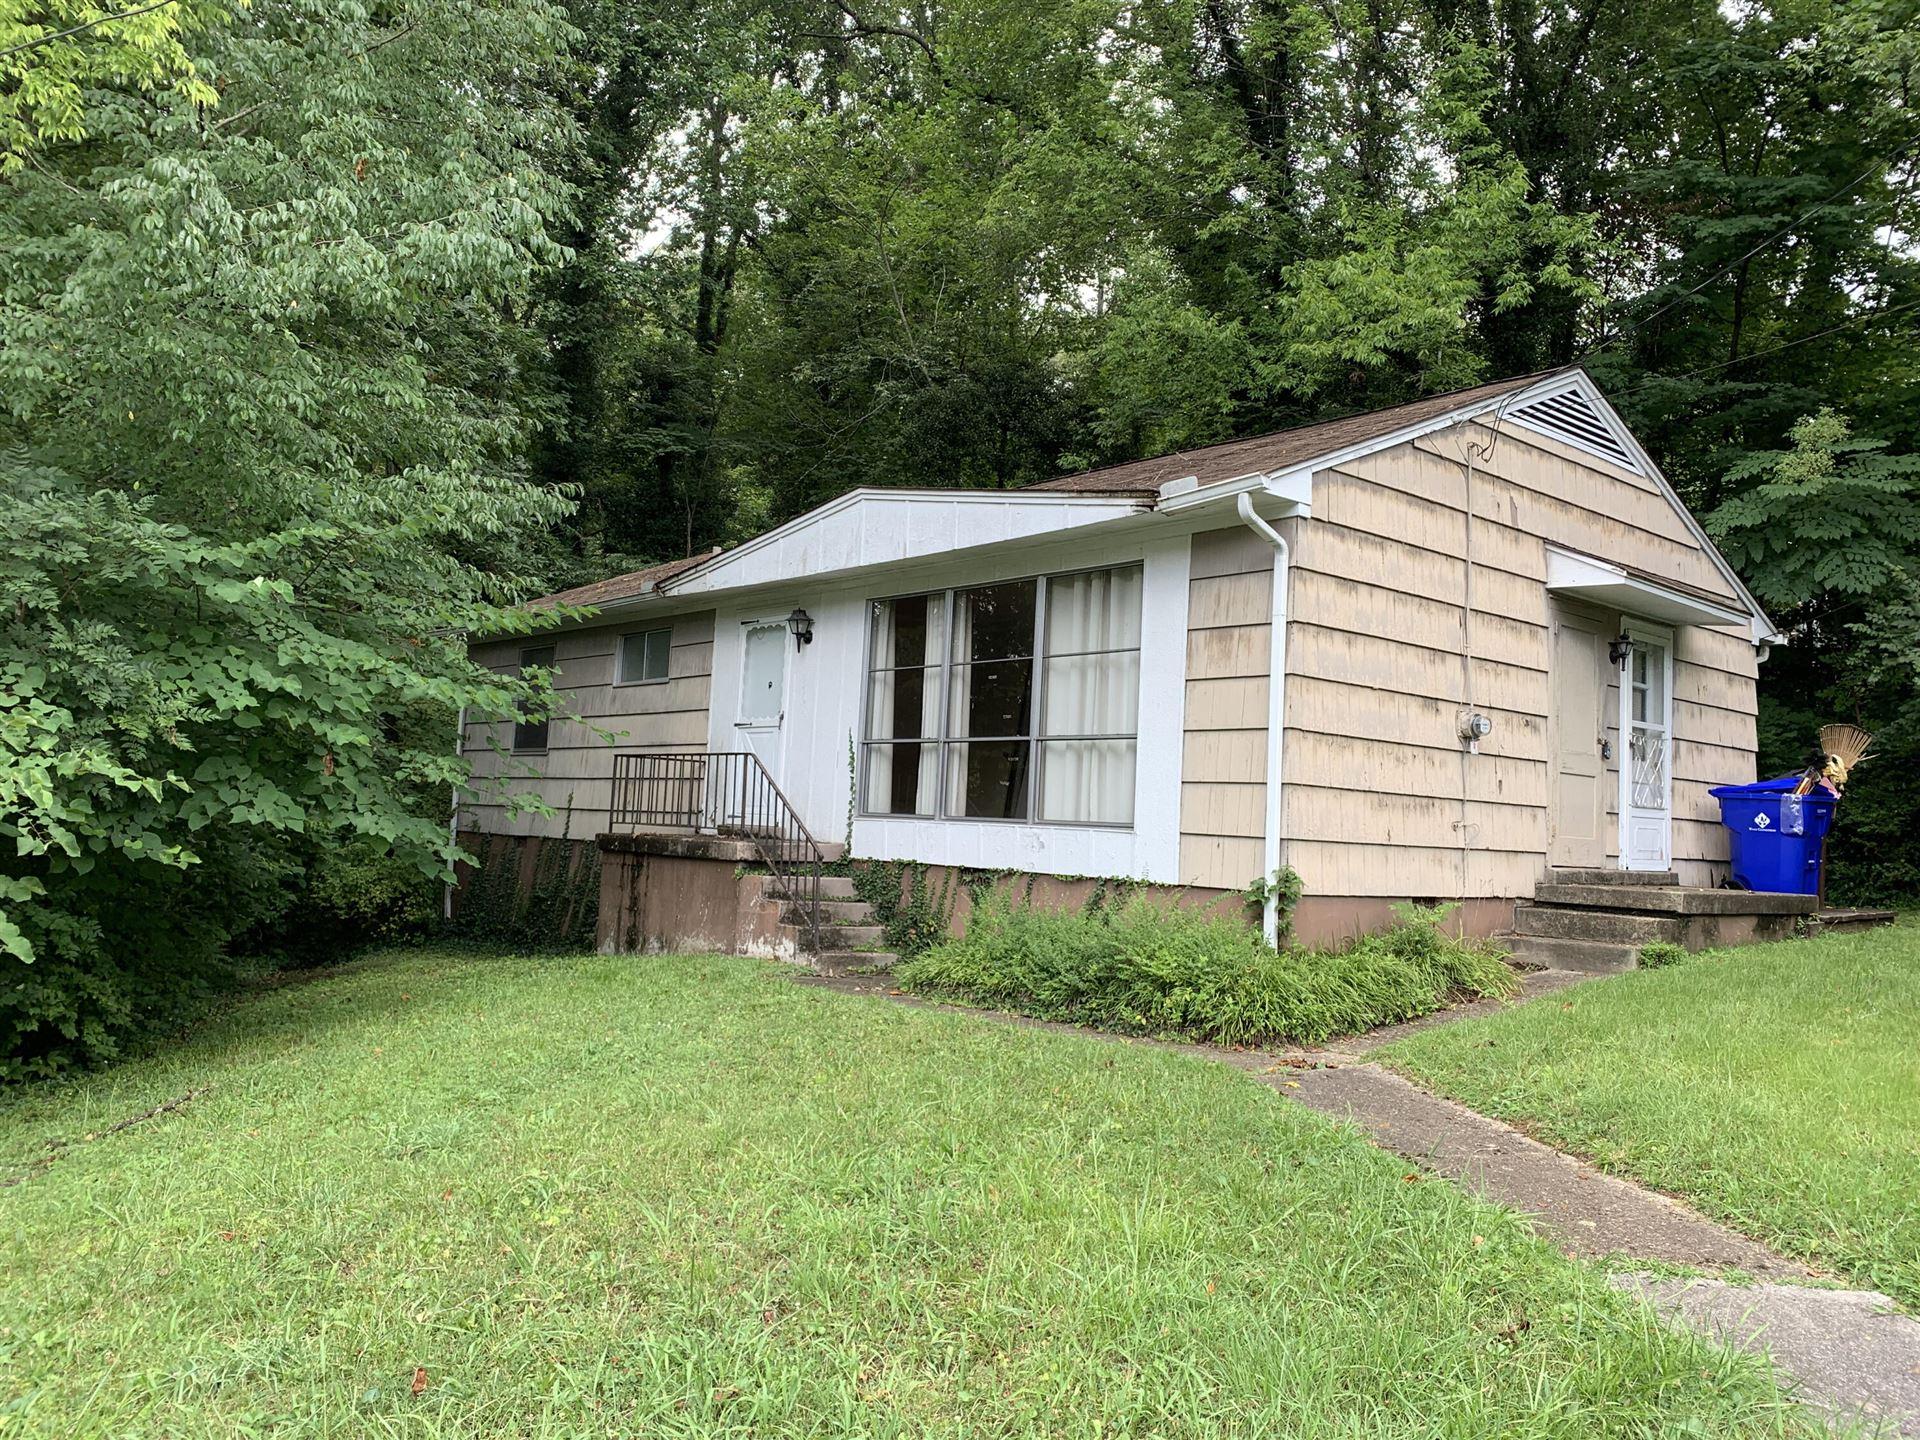 Photo of 149 Alger Rd, Oak Ridge, TN 37830 (MLS # 1160714)